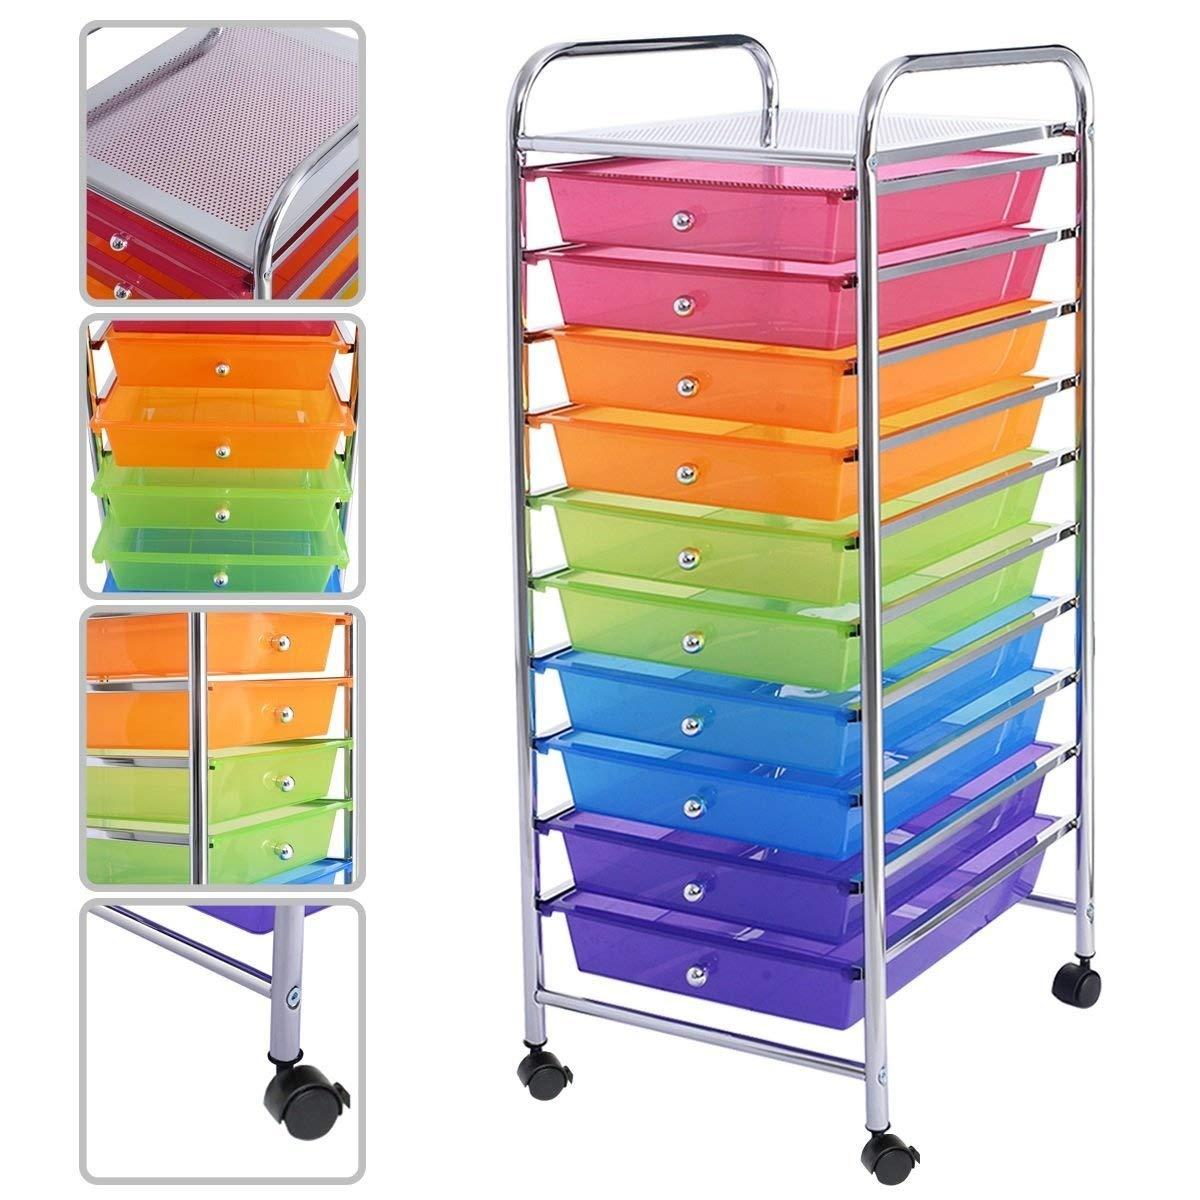 10 Drawer Rolling Storage Cart Scrapbook Paper Office School Organizer Rainbow US Ship